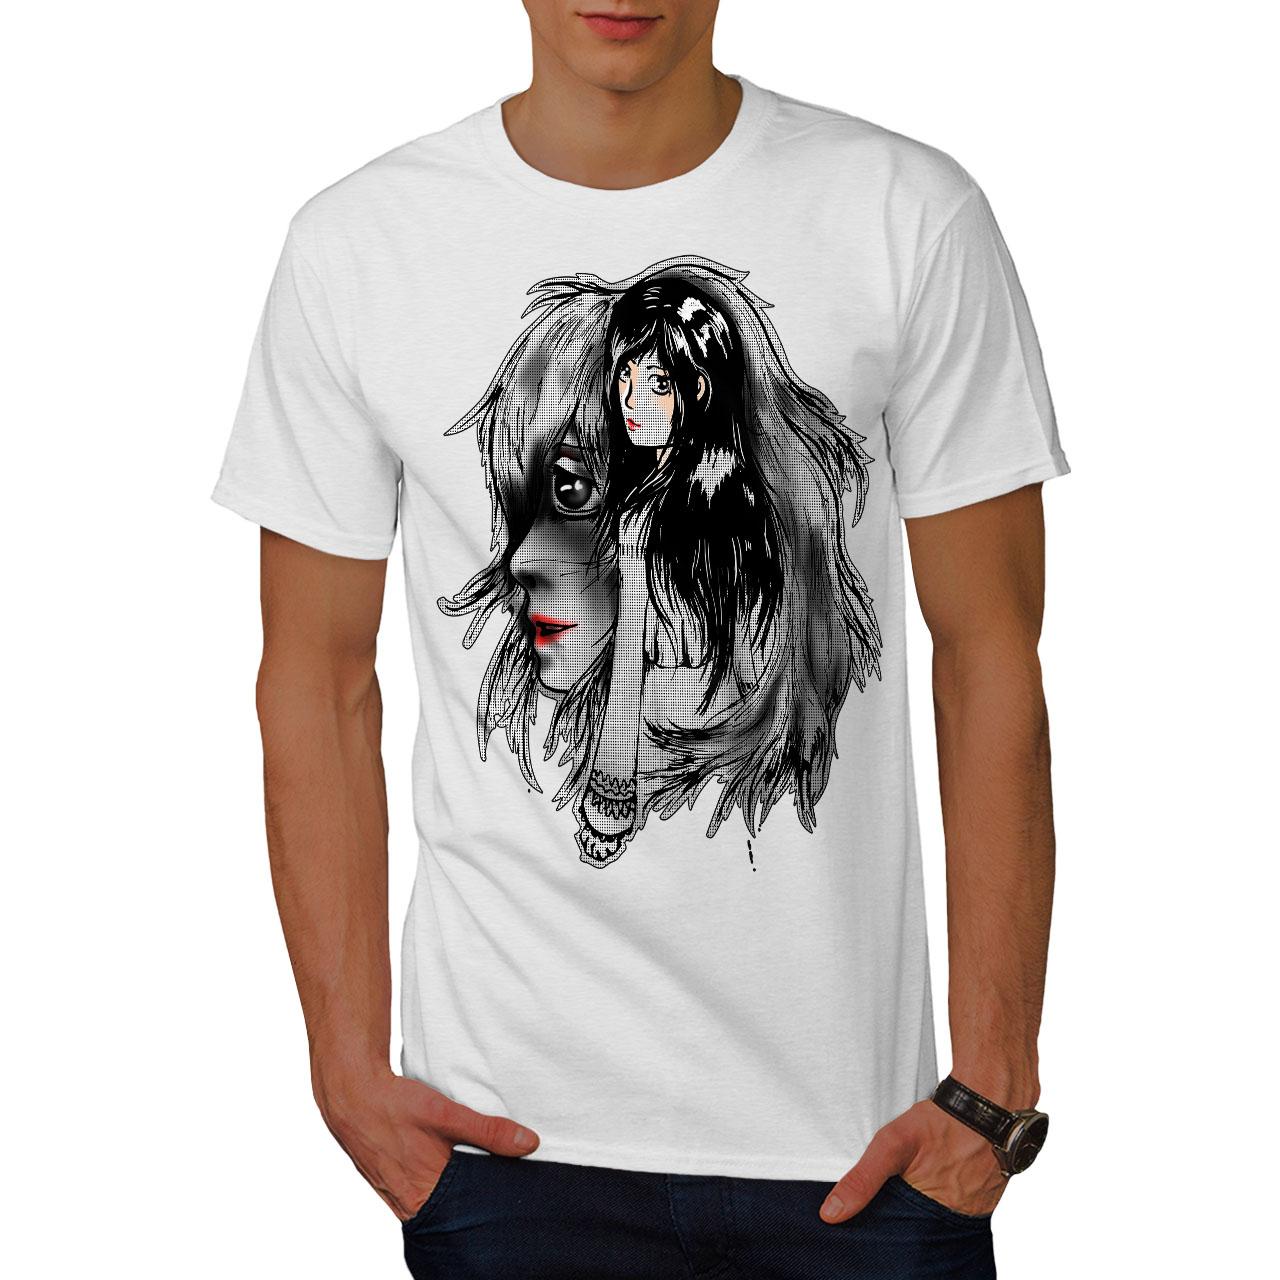 Wellcoda-bellissime-ANIME-Da-Uomo-T-shirt-misterioso-design-grafico-stampato-T-shirt miniatura 9